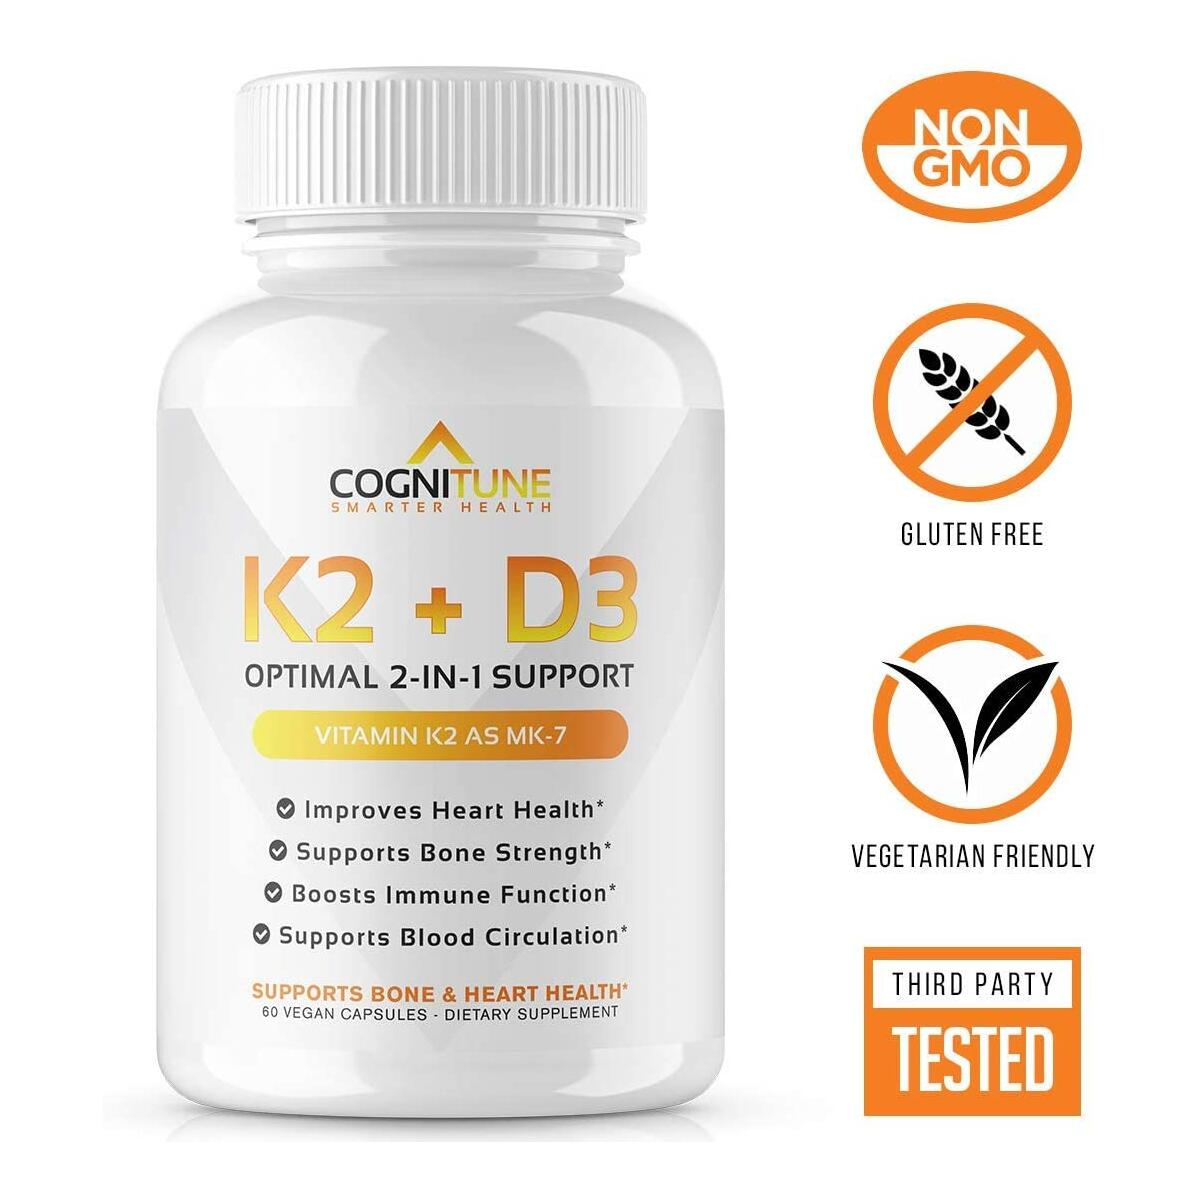 Vitamin D3 5000 IU with Vitamin K2 (MK7) Supplement - Premium Immune, Heart & Bone Health Capsules - Vitamin D3 K2 Complex with 5000 IU of Vitamin D 3 & 90 mcg of Vitamin K 2 - 60 Count